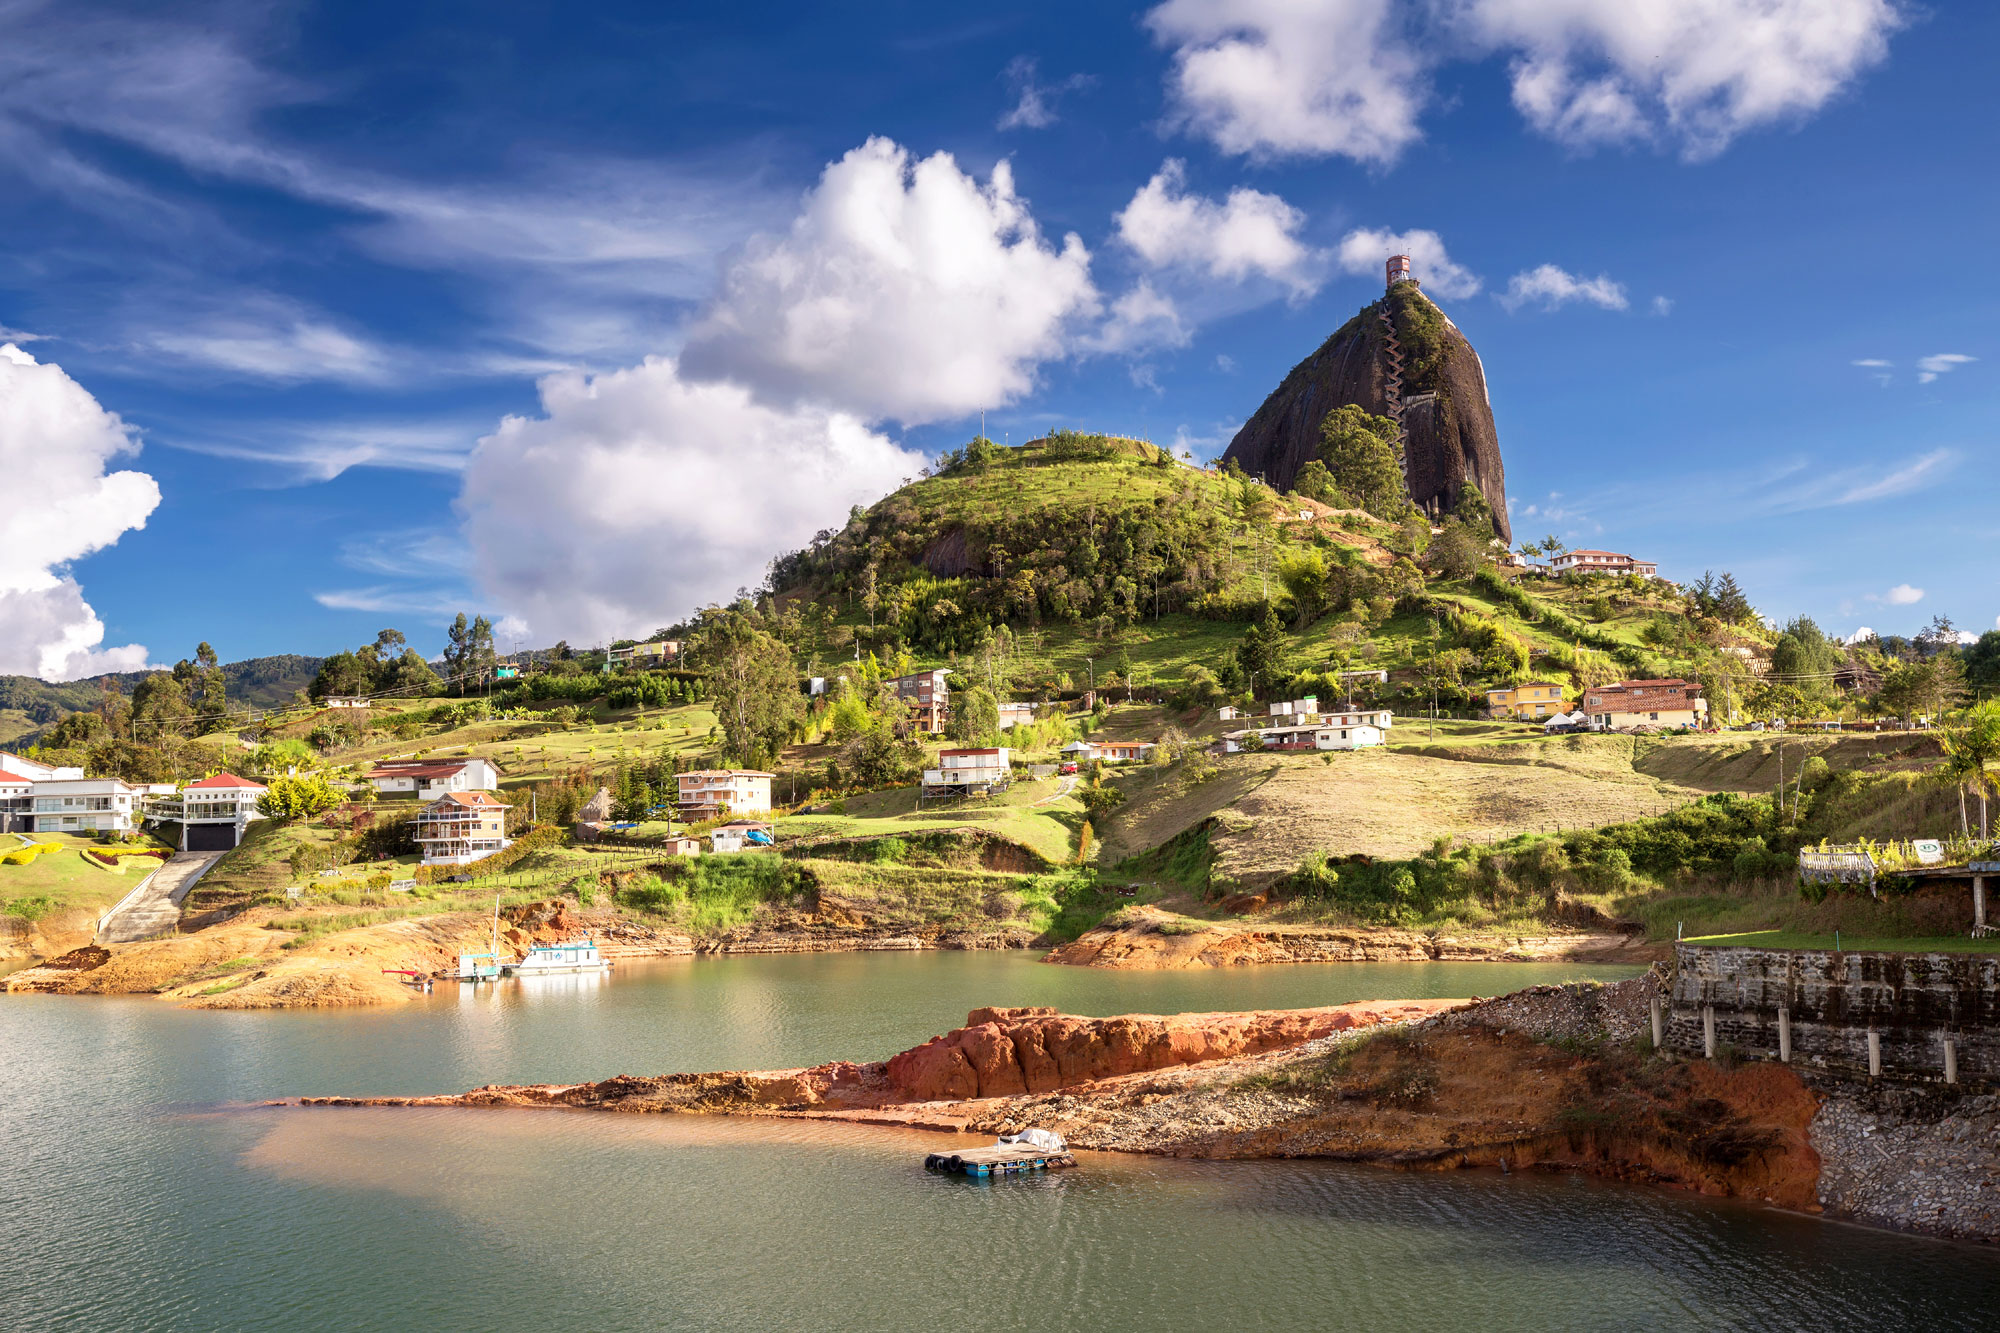 The Rock near Guatape, Colombia